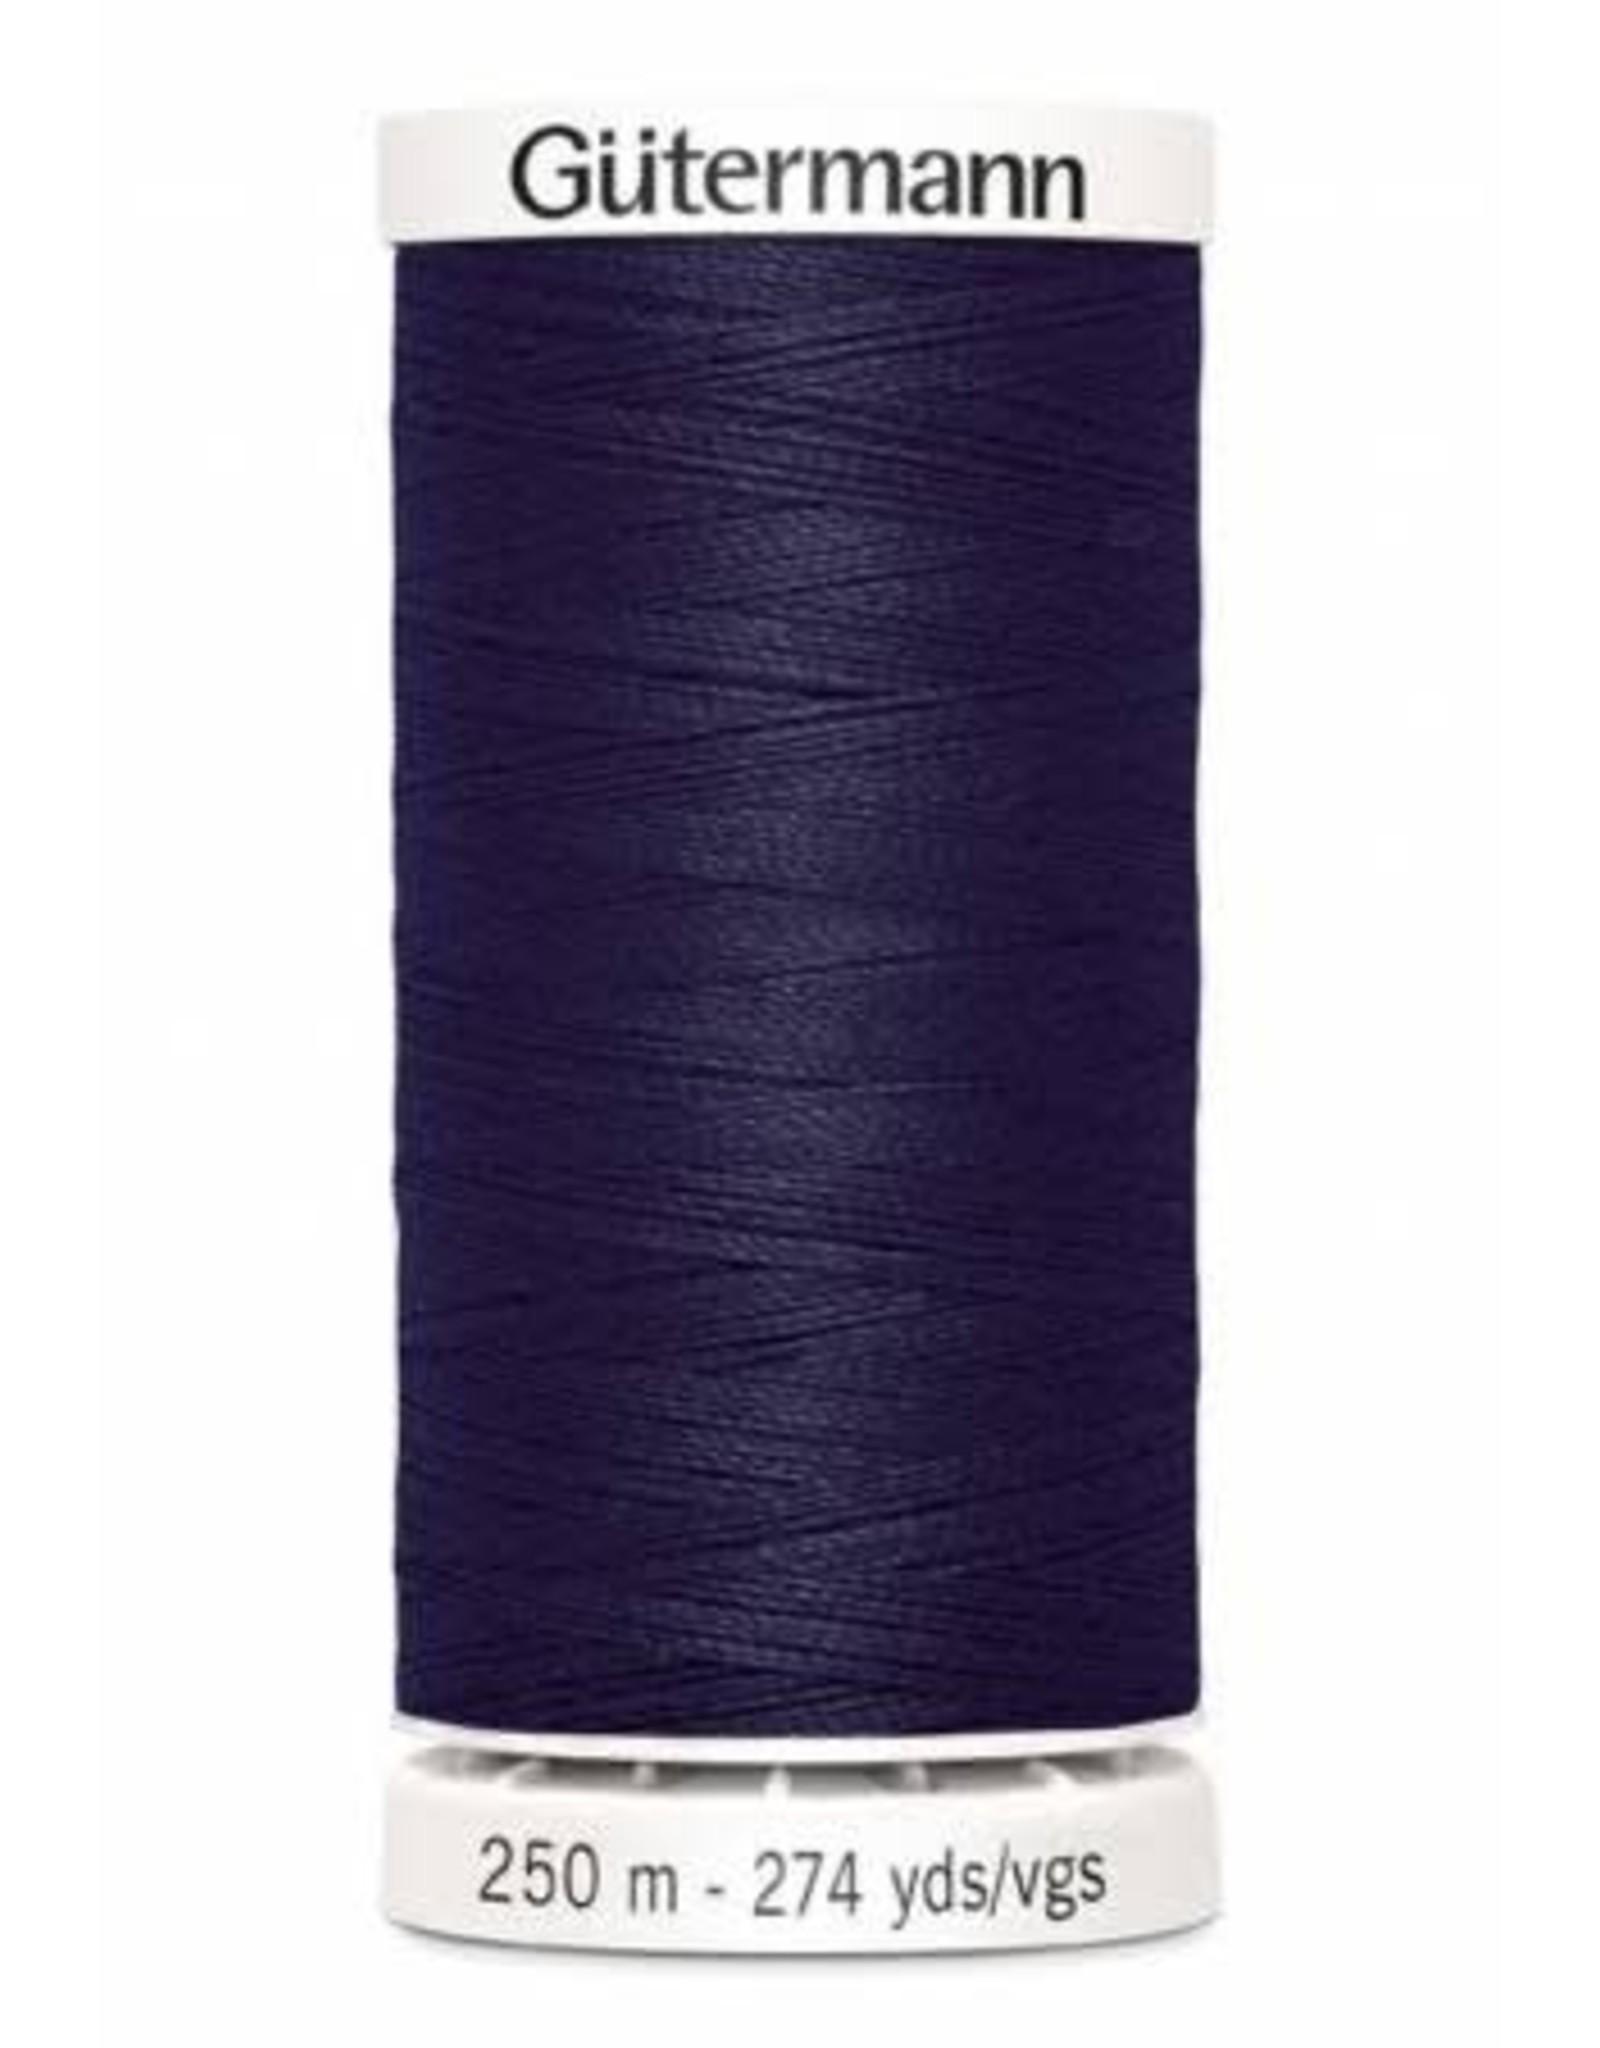 Gutermann Gutermann Thread, 250M-278 Midnight Navy Blue, Sew-All Polyester All Purpose Thread, 250m/273yds